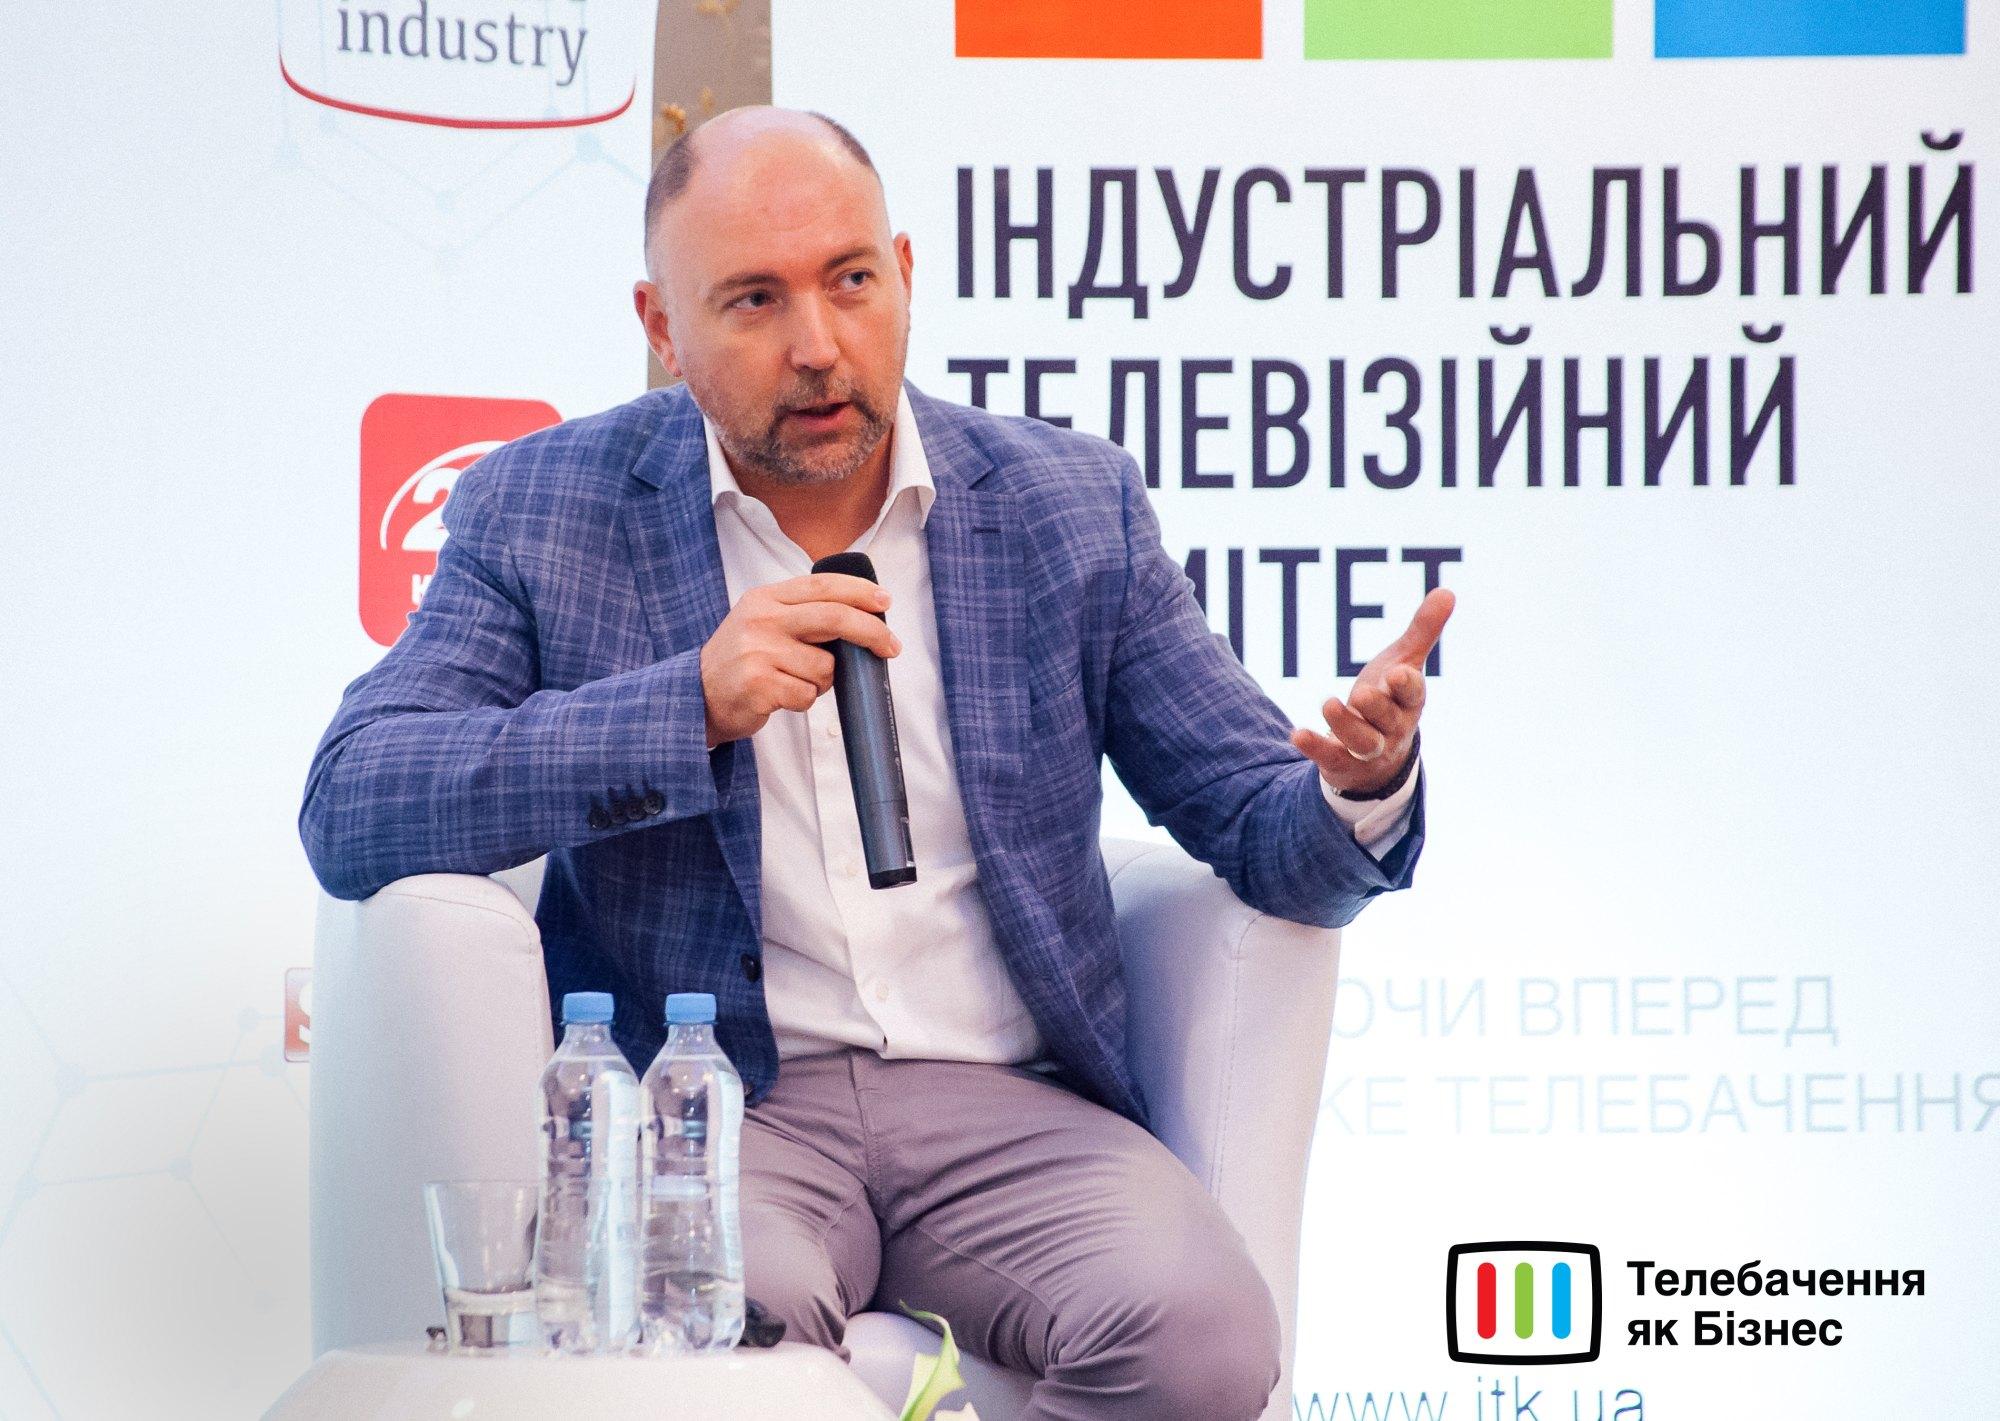 Олександр Богуцький, Директор-президент телеканалу «ICTV»